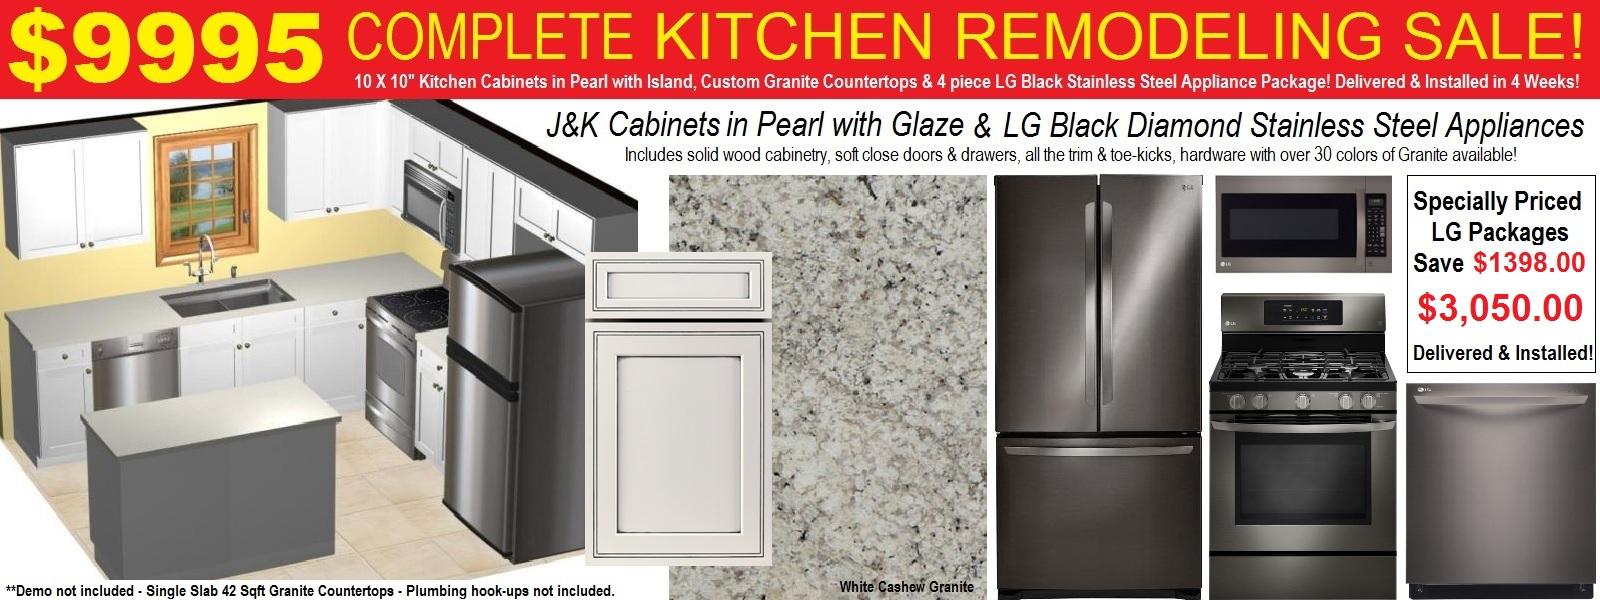 kitchenazcabinets kitchen remodeling contractor Kitchen Cabinets Countertops Glendale AZ